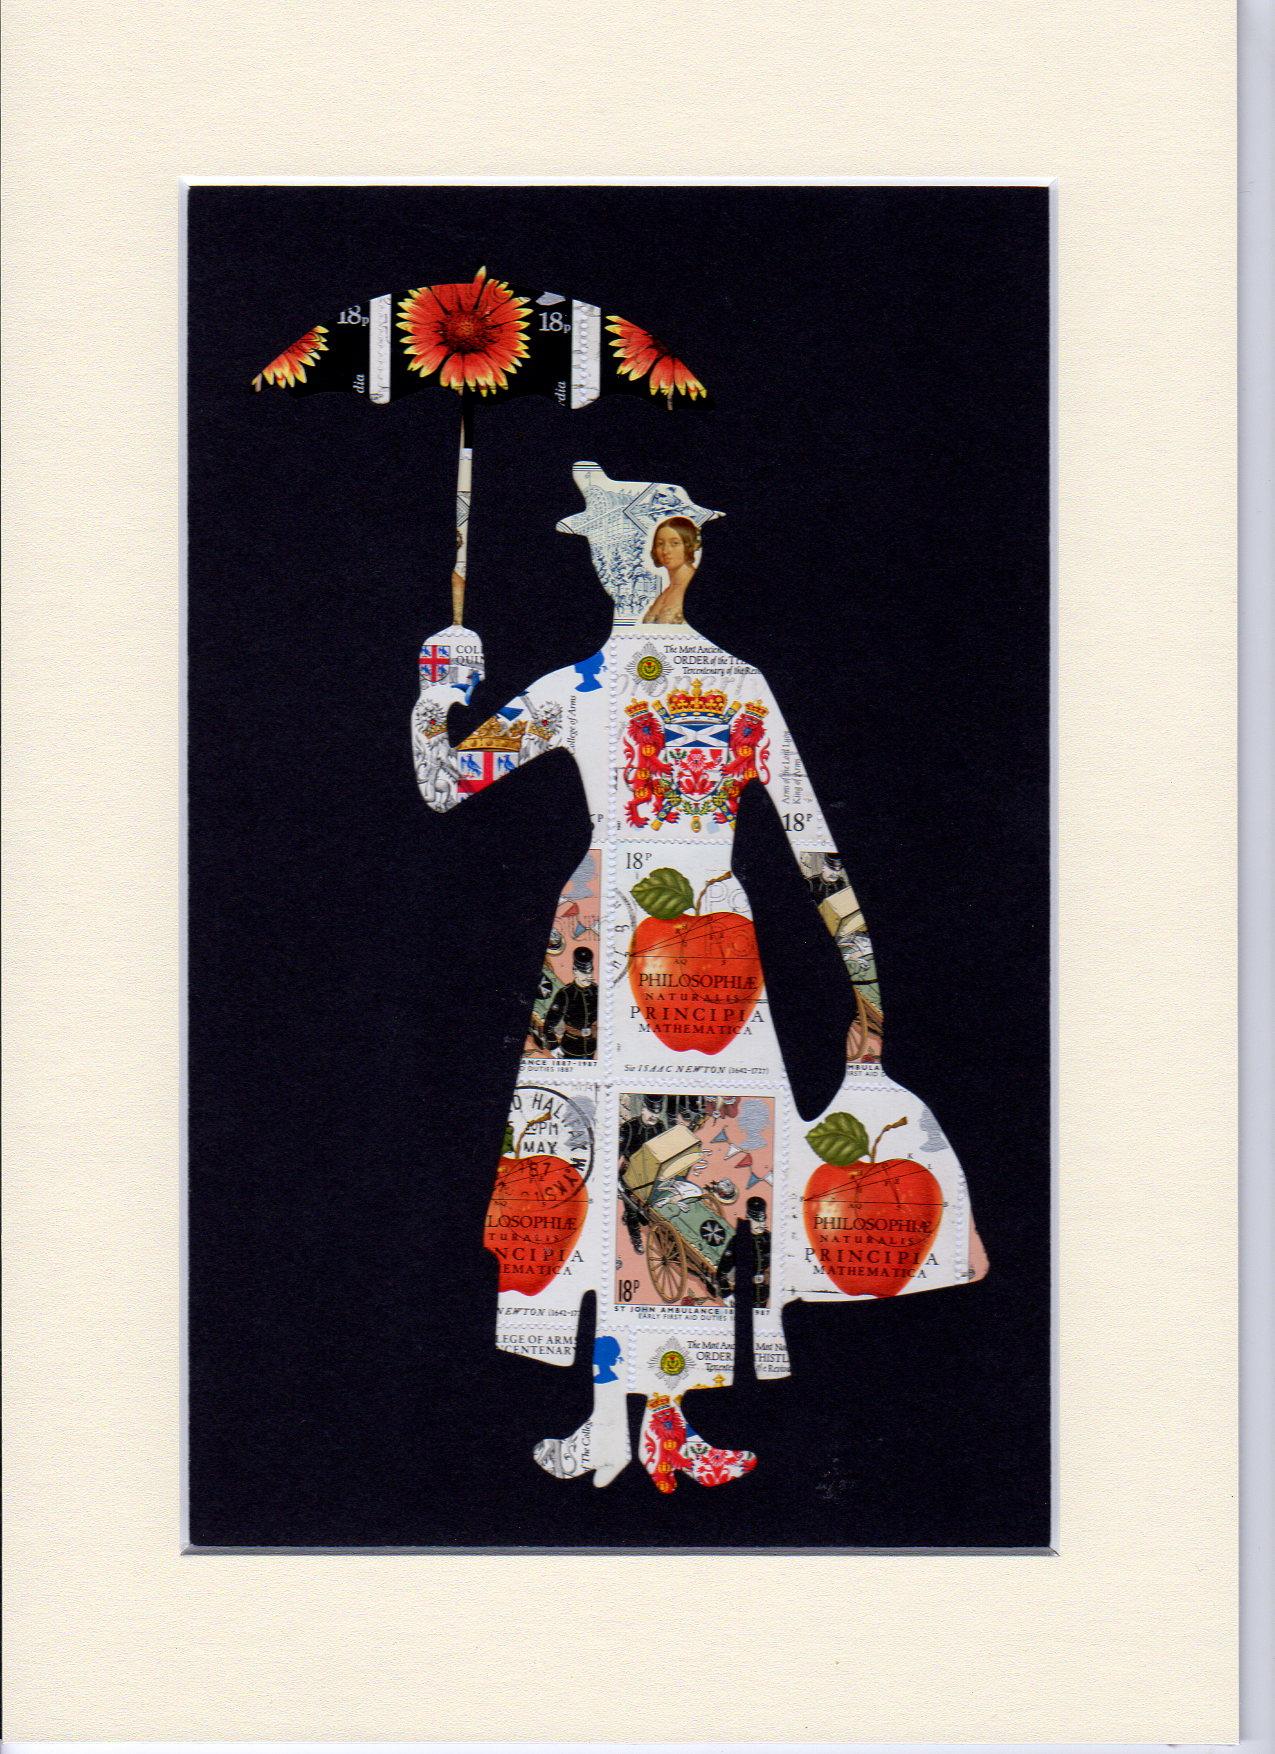 1987 special mary p015.jpg